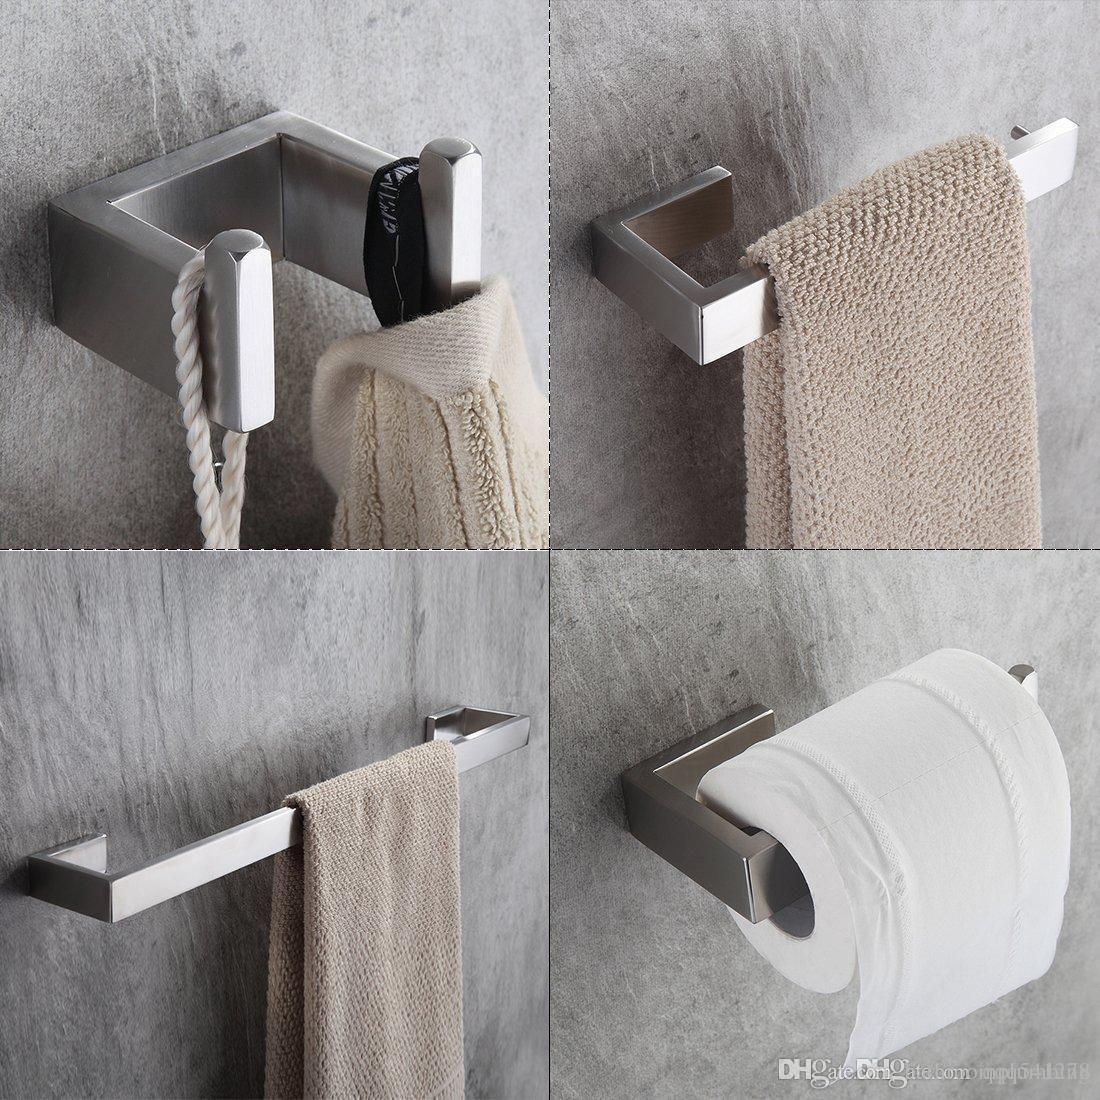 20 Funky Bathroom Accessories Set Ceplukan Bathroom Accessory Set Brushed Nickel Bathroom Bathroom Accessories